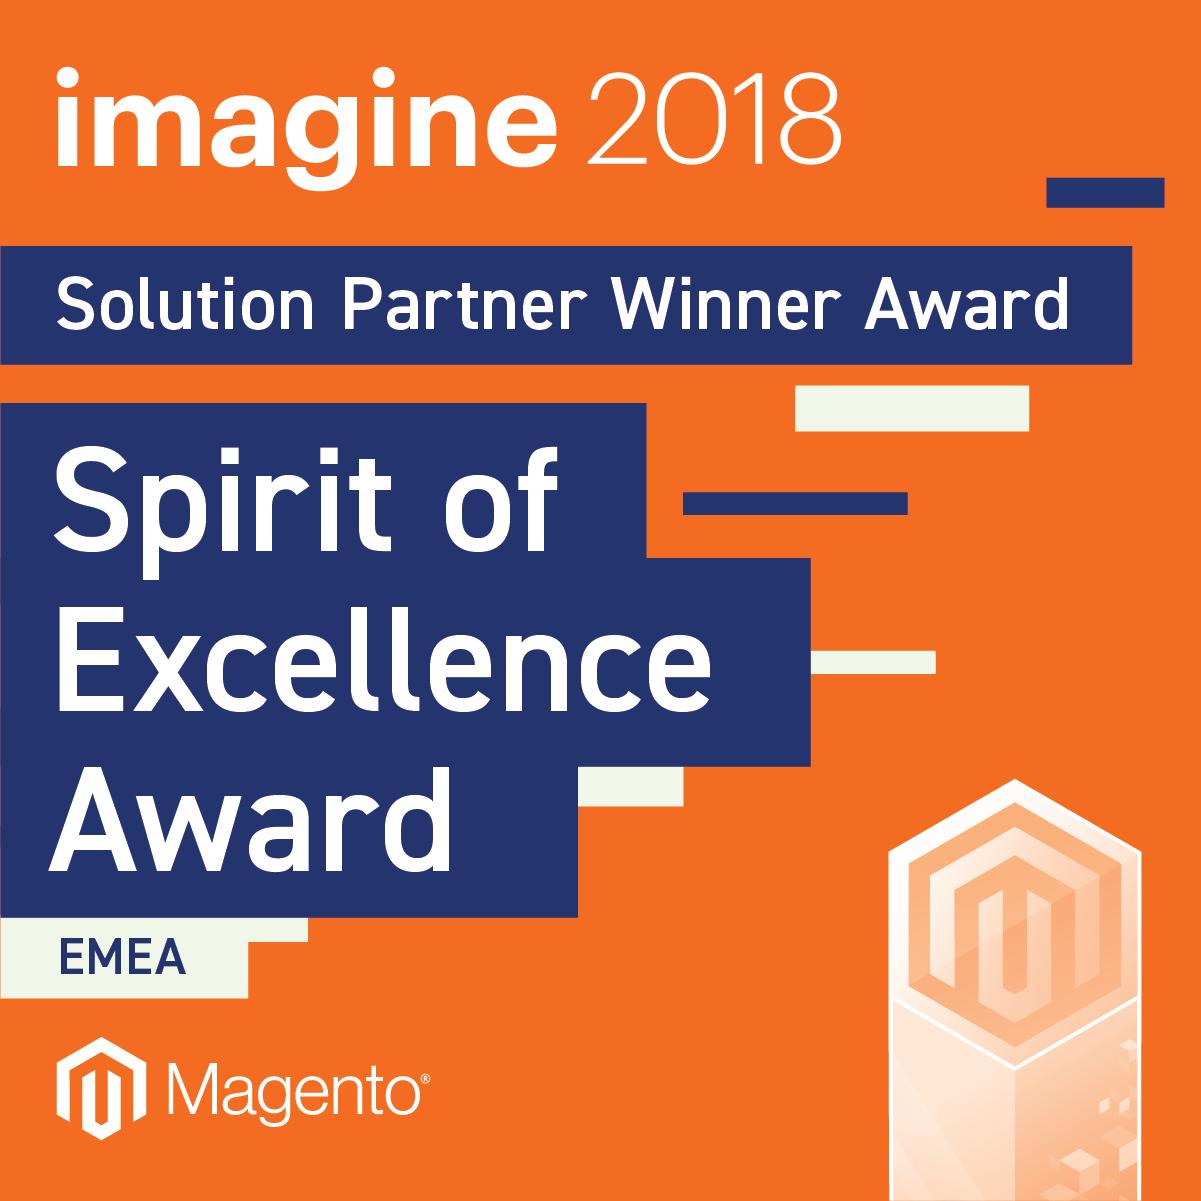 Magento Spirit of Excellence Award Winner